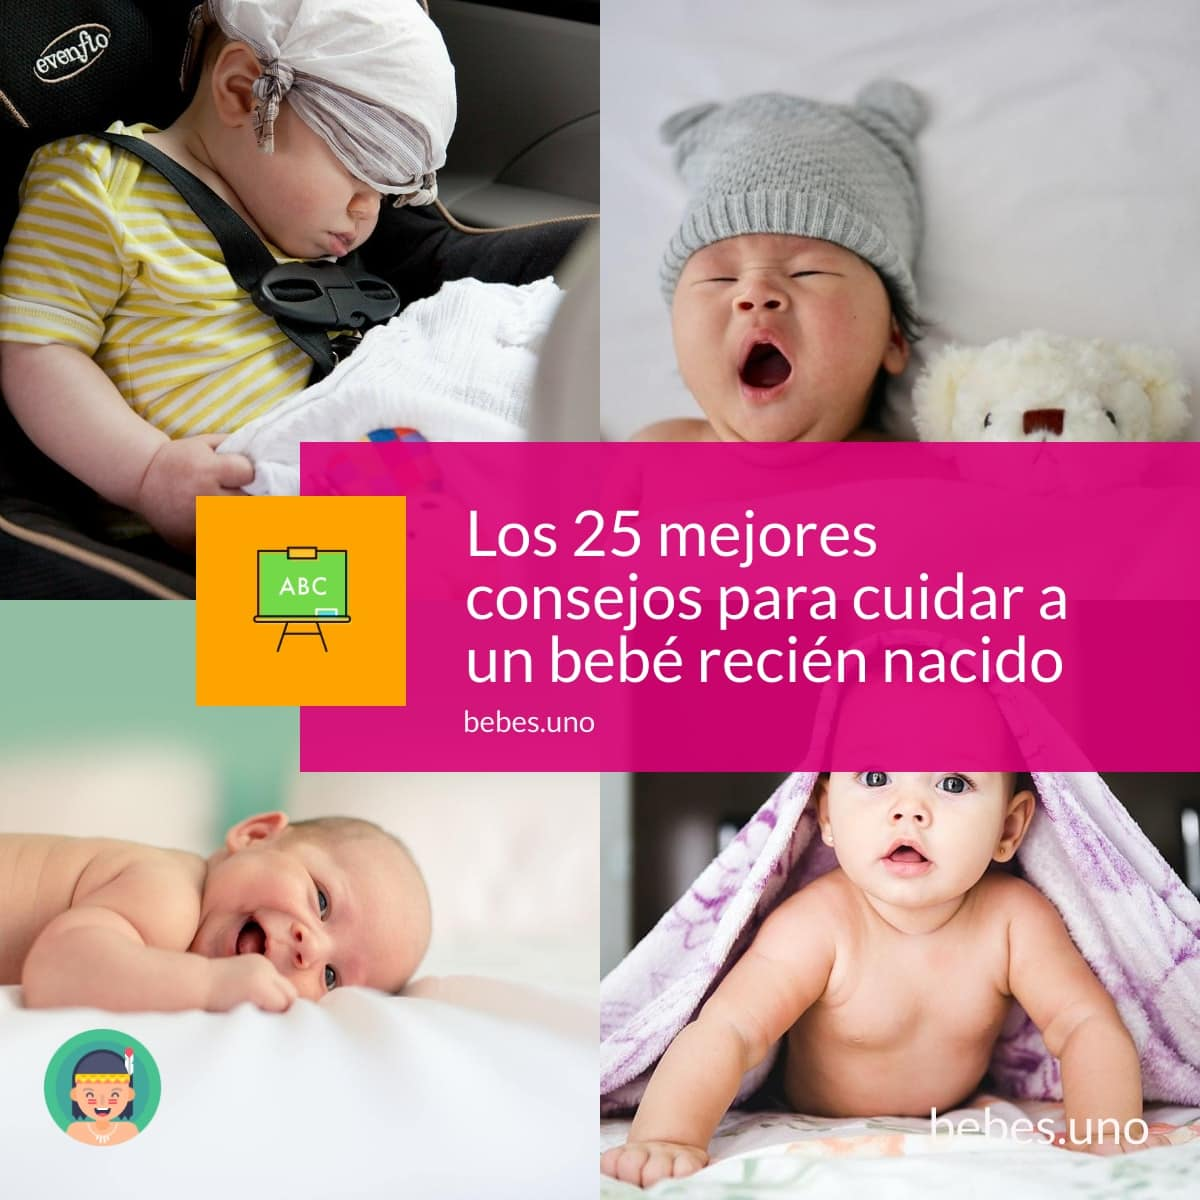 25 consejos imprescindibles para cuidar correctamente a un recién nacido